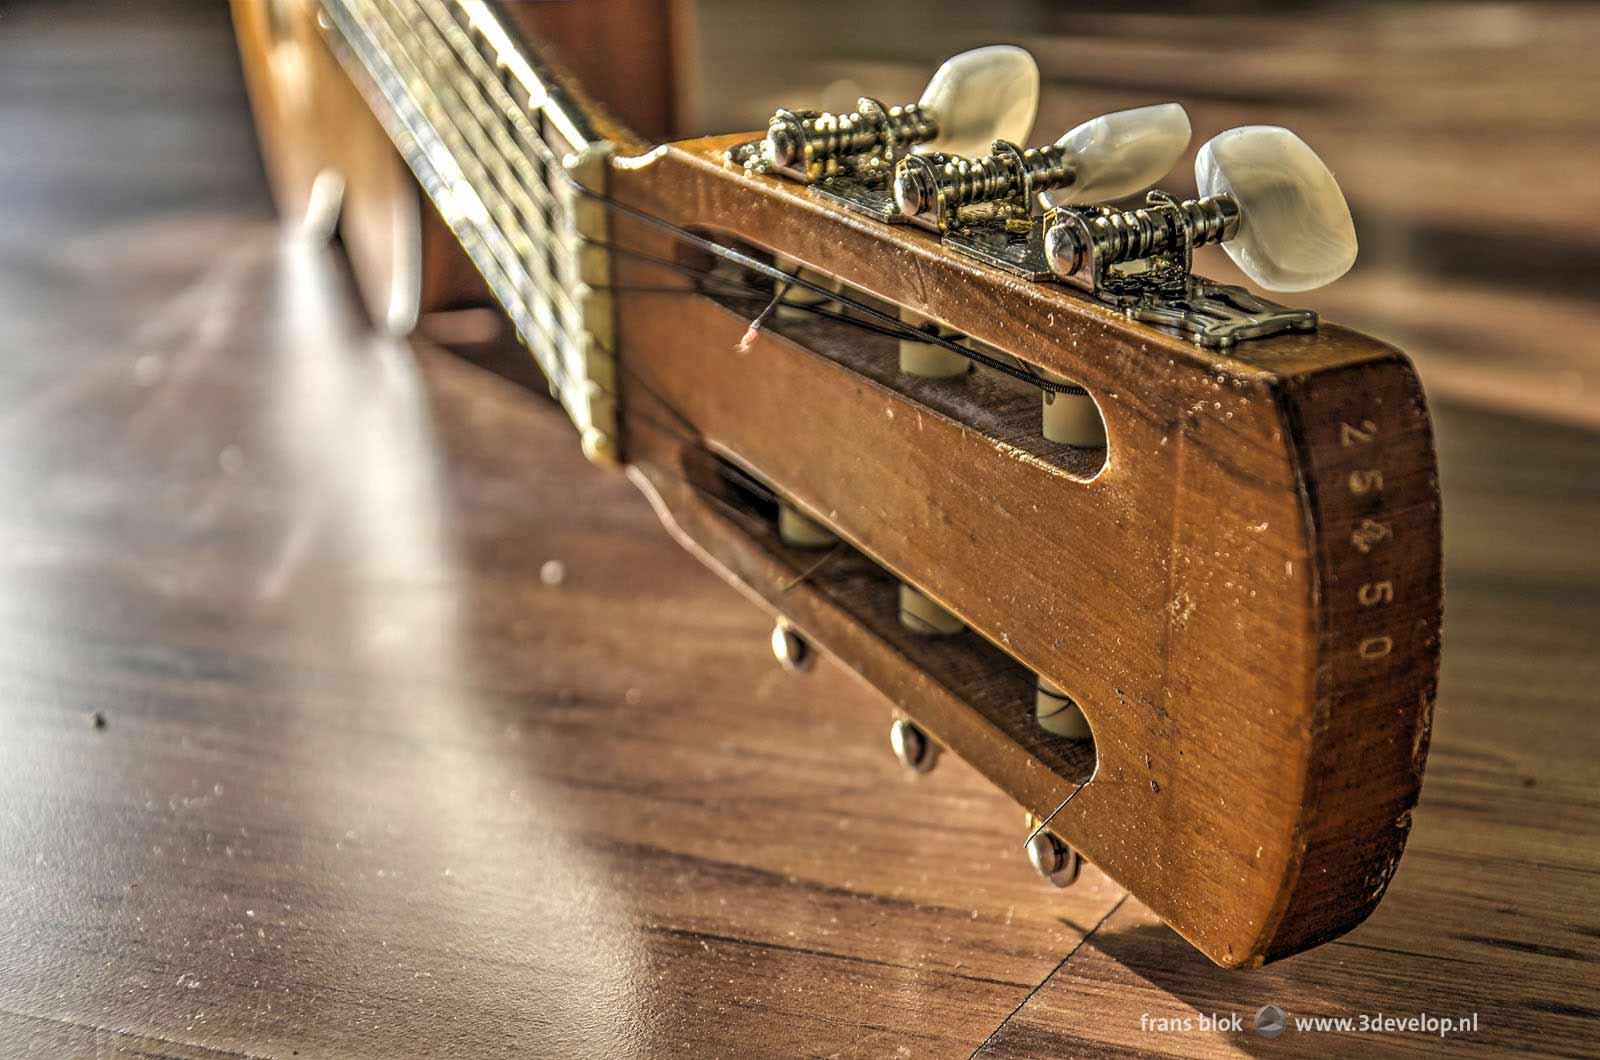 gitaar-laminaat-stemmechaniek